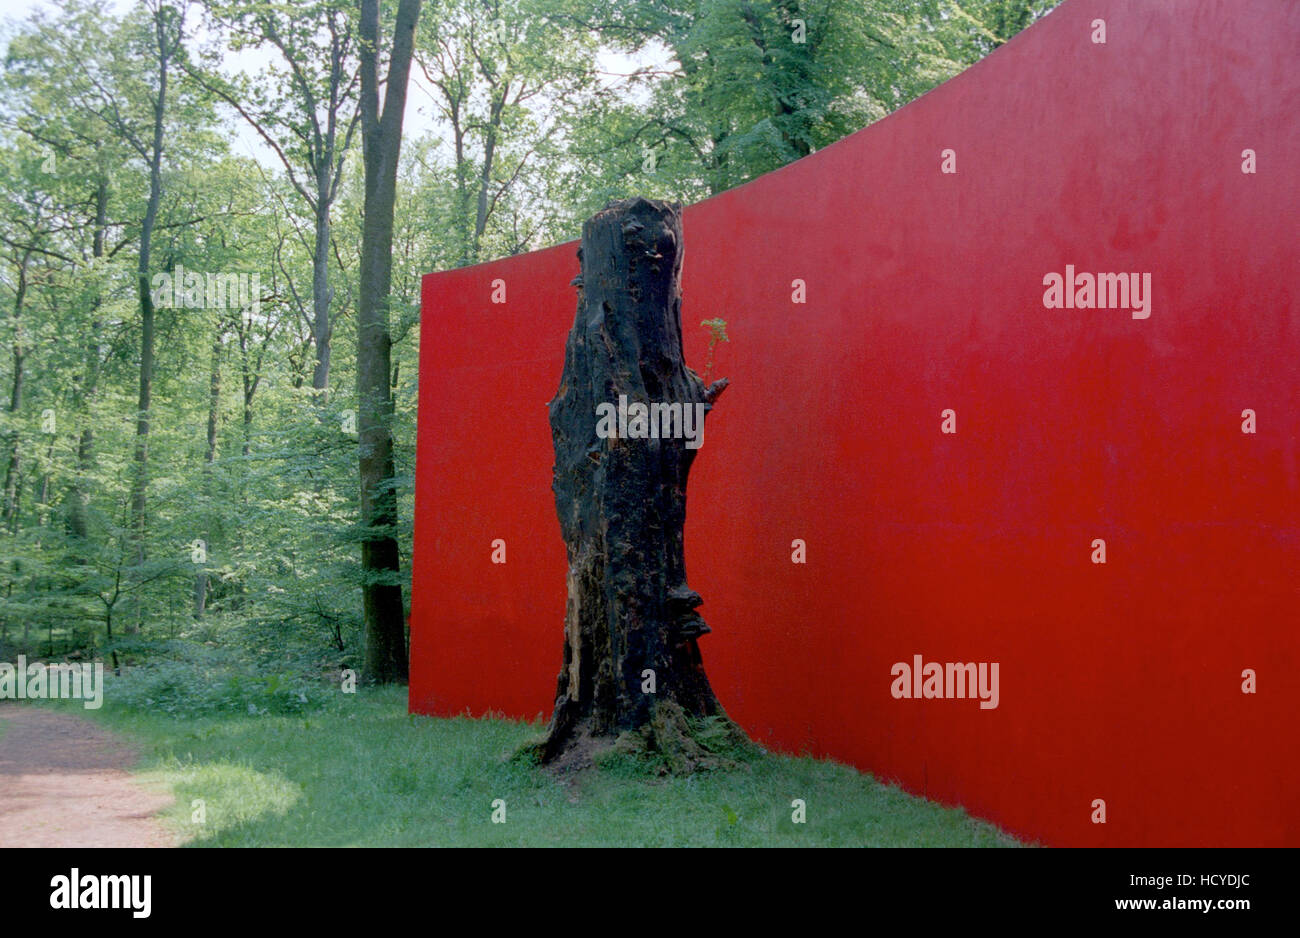 VANÅS CASTLE art installation in the nature - Stock Image